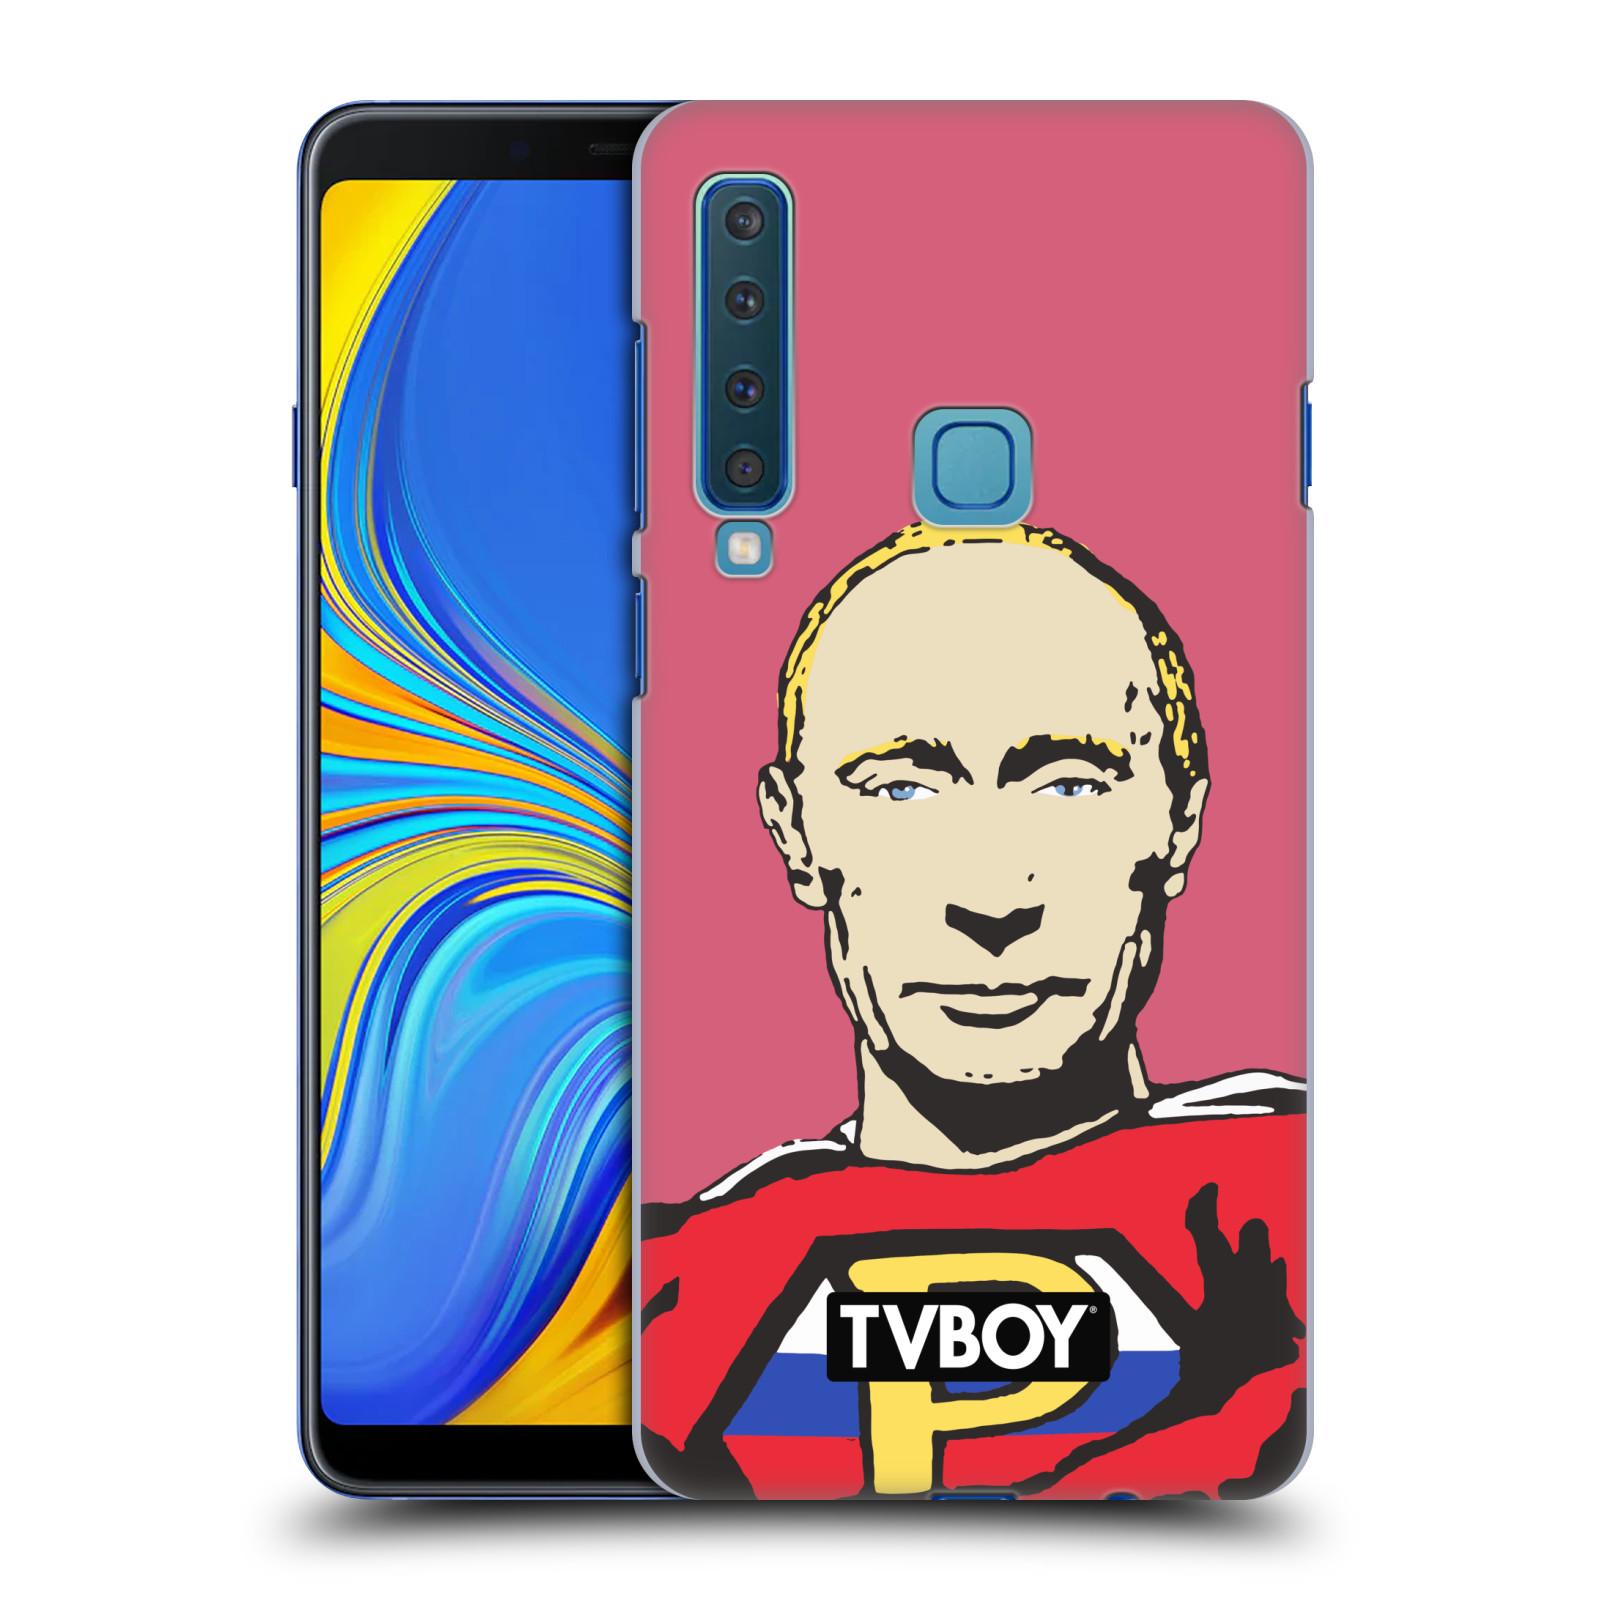 Plastové pouzdro na mobil Samsung Galaxy A9 (2018) - Head Case - TVBOY - Super Putin